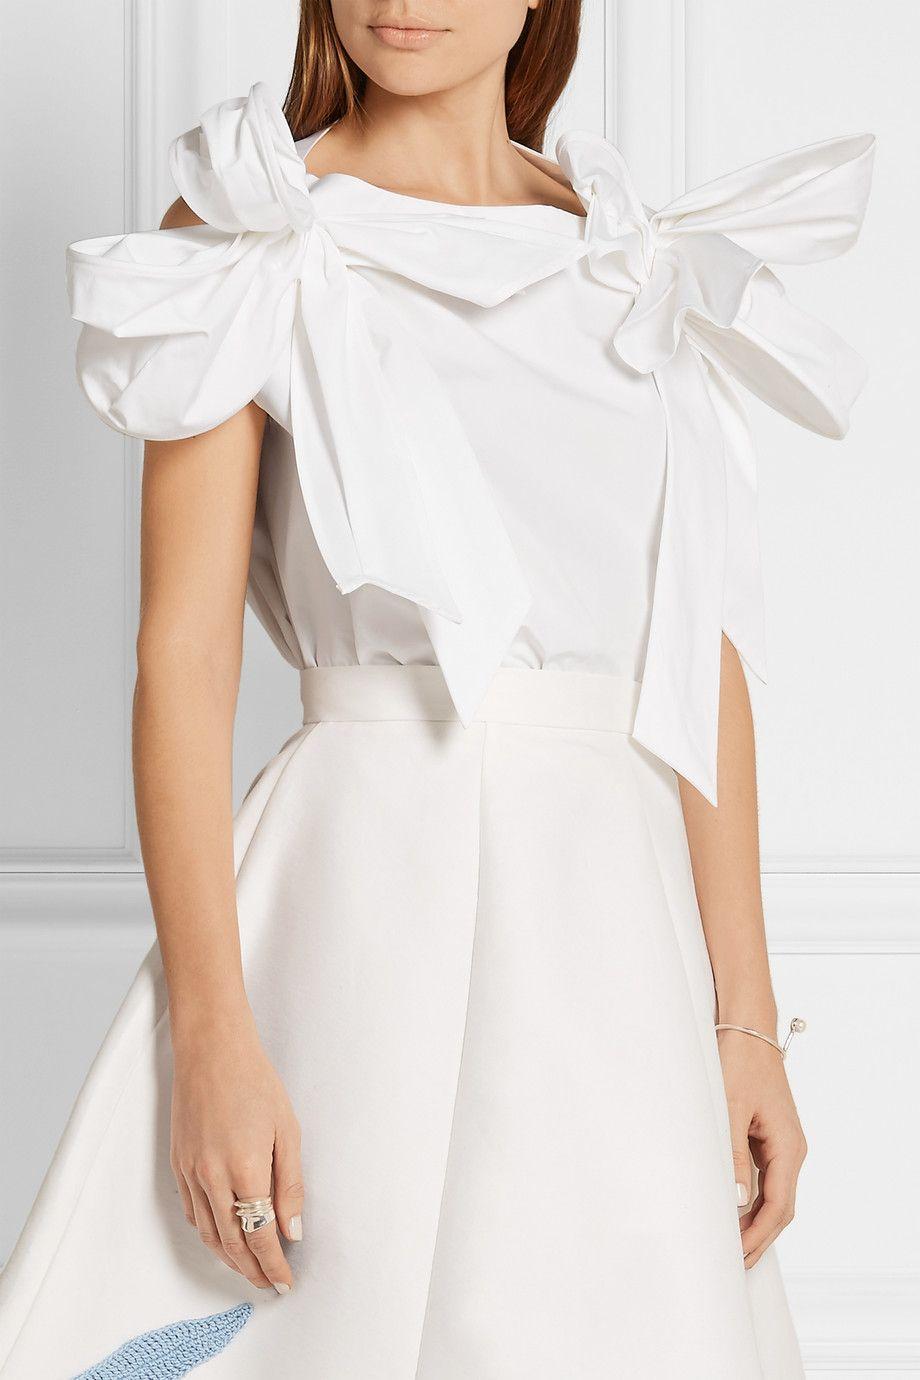 Bow-embellished cotton-poplin top. White cotton-poplin - Slips on - 100% cotton (Vika Gazinskaya)